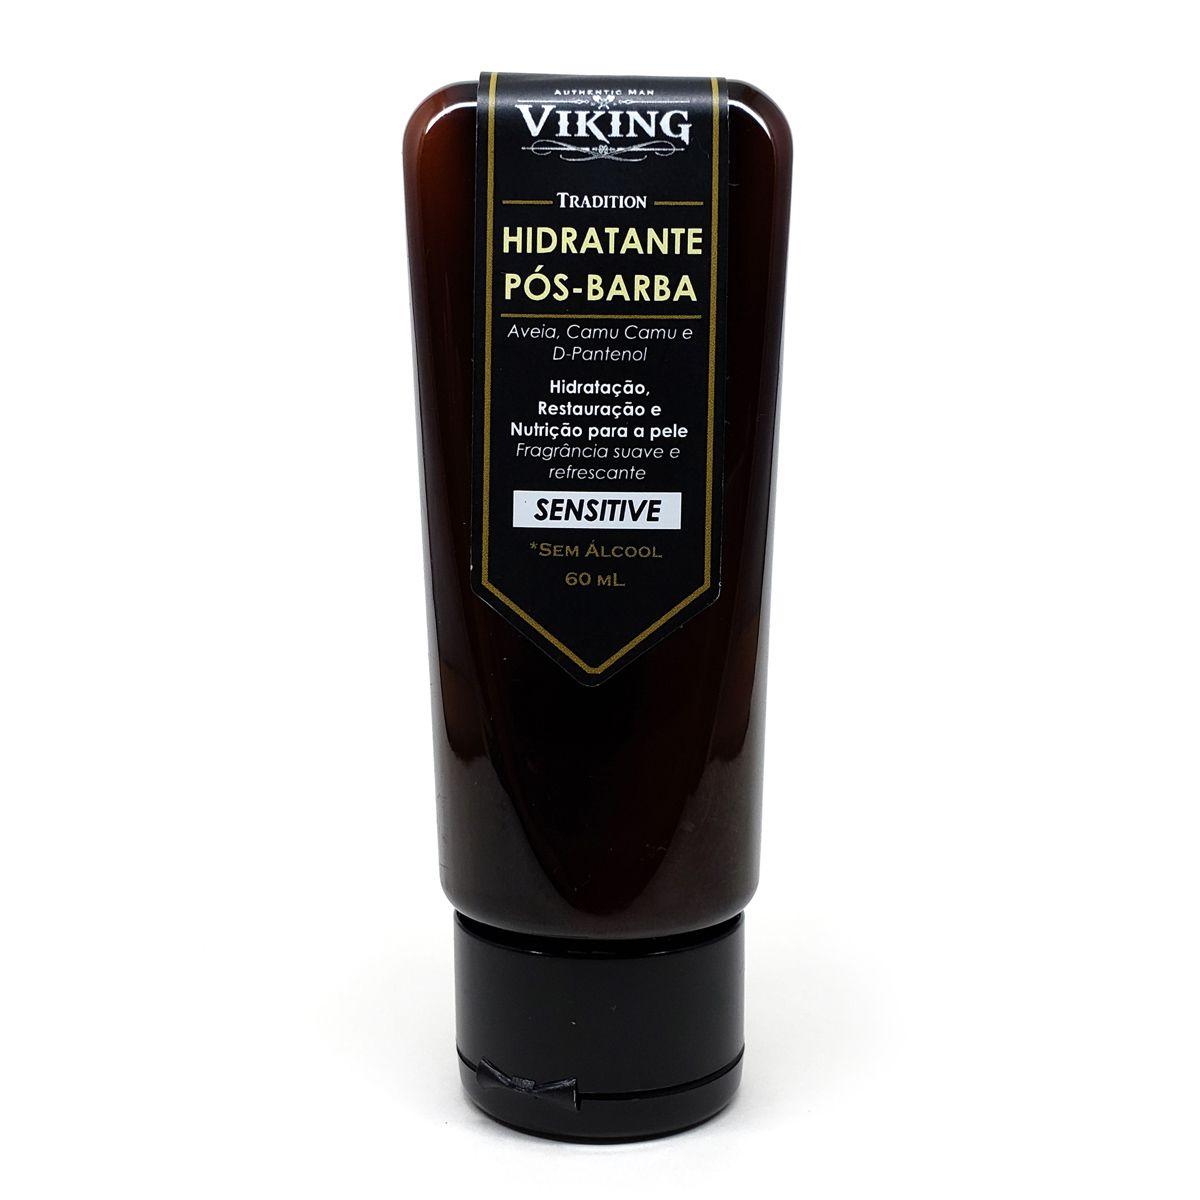 Hidratante Pós-Barba Sensitive Viking Tradiition 60ml